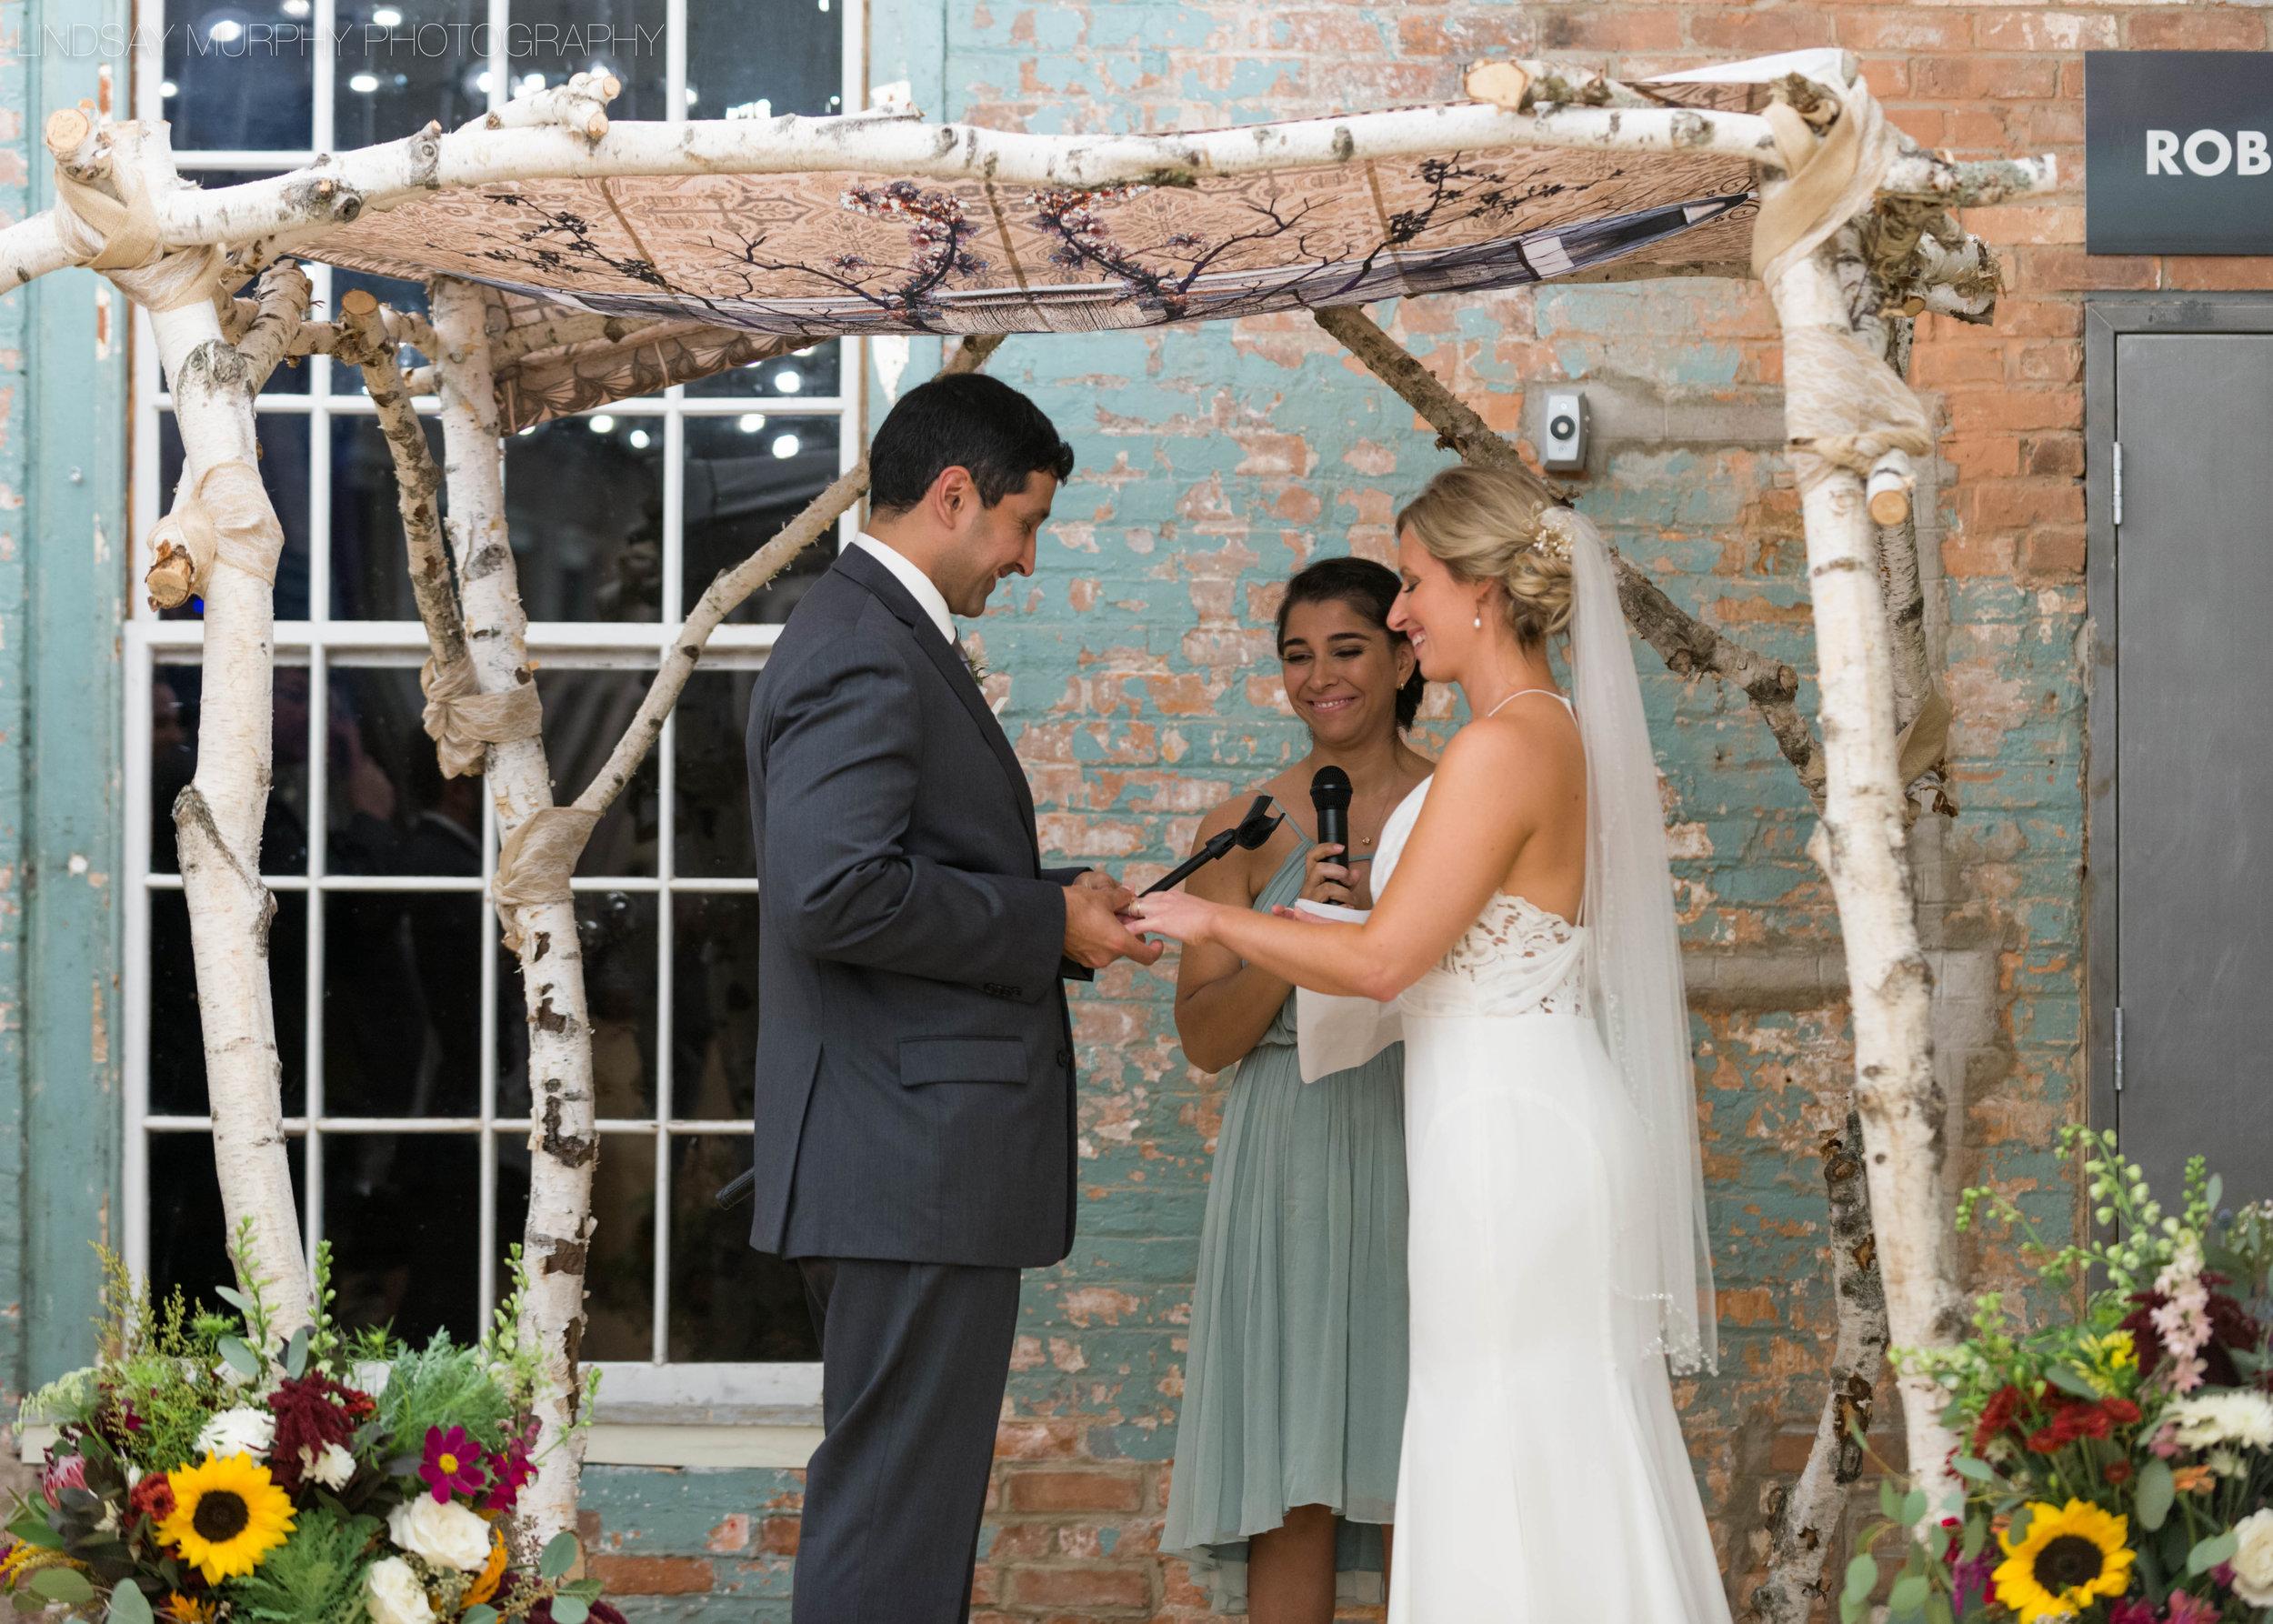 New_England_wedding-53.jpg